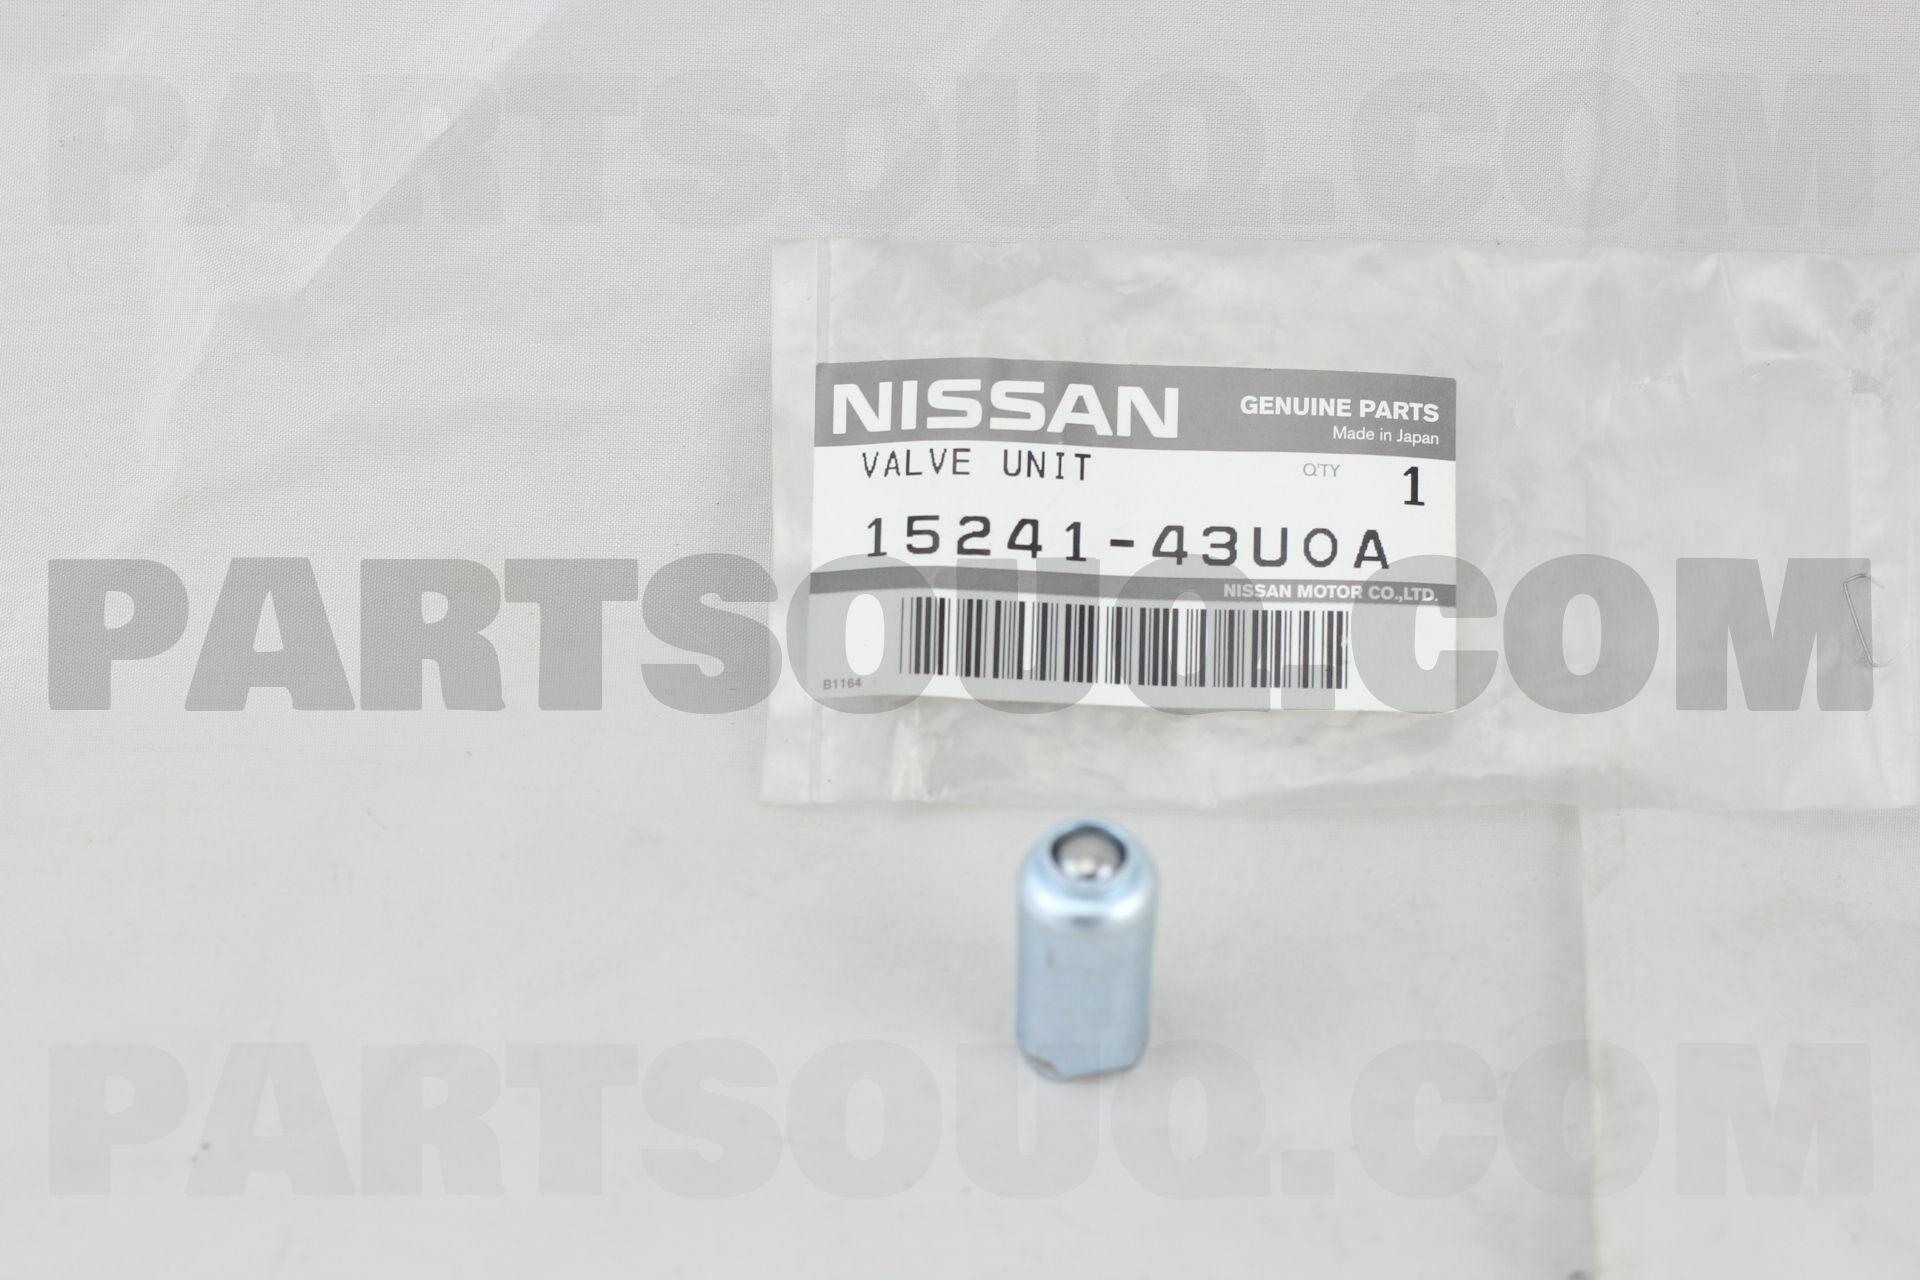 Genuine Nissan Oil Pressure Regulator Relief Valve 15241-43U0A